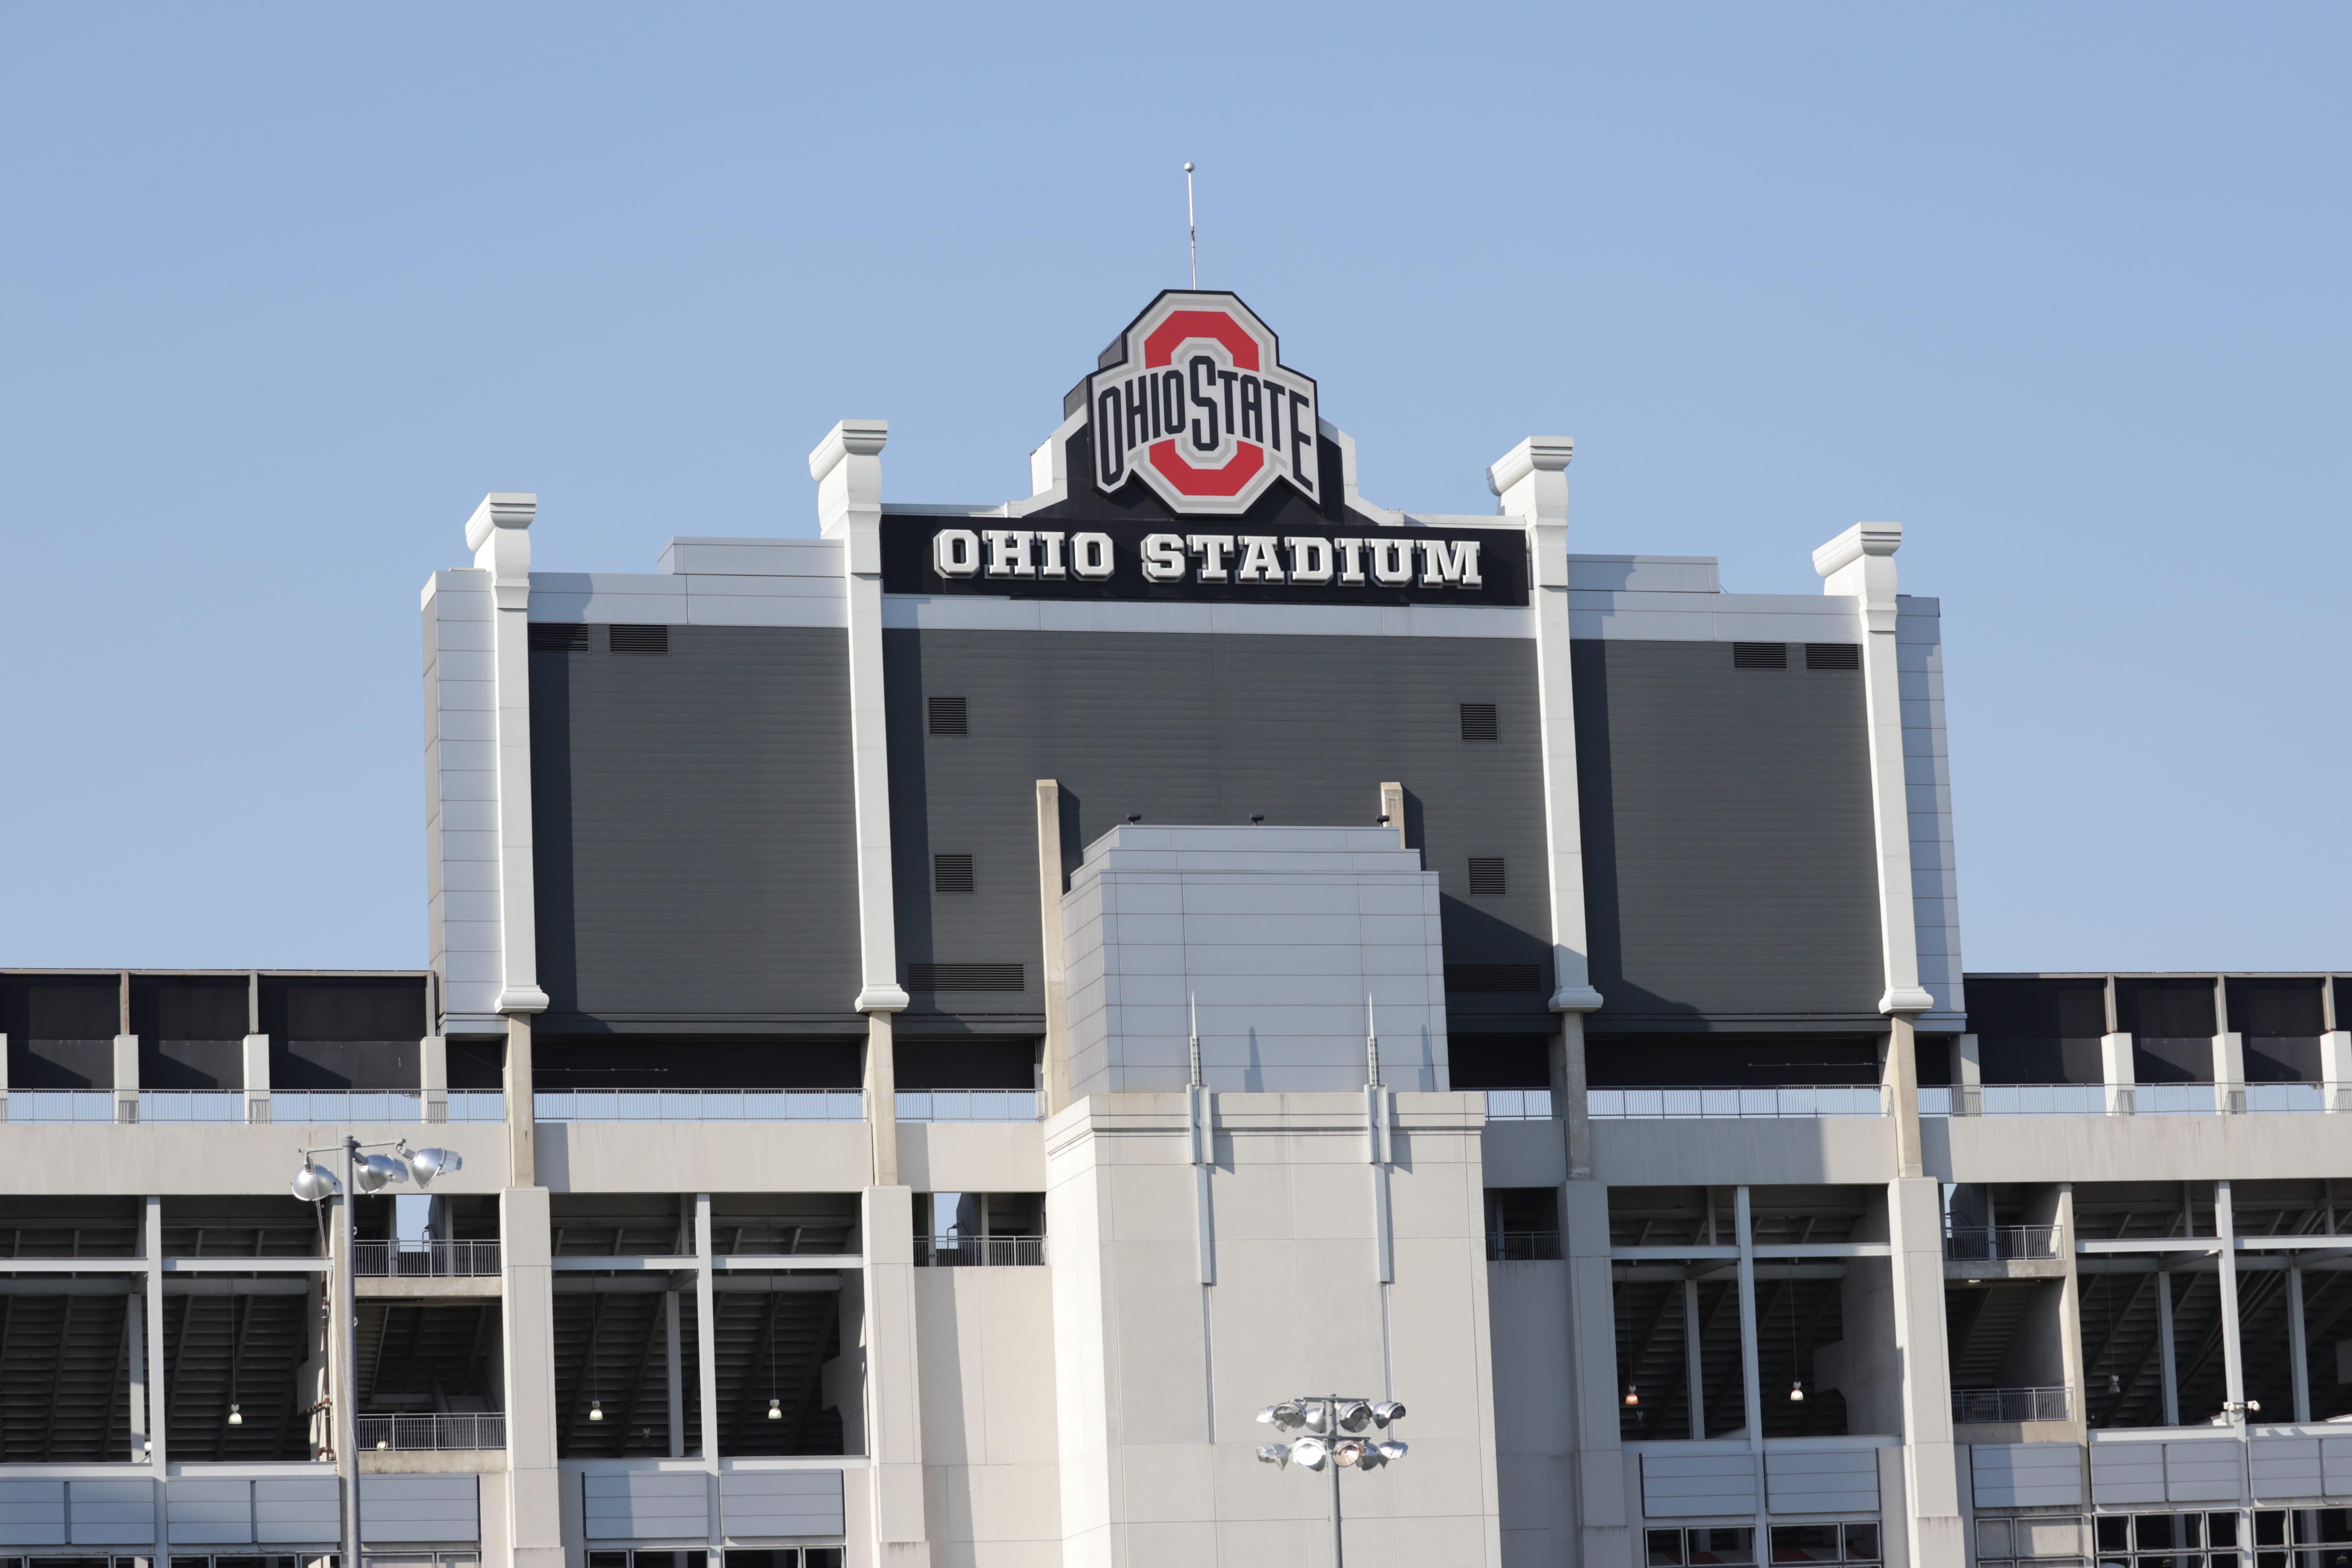 the outside of the ohio stadium